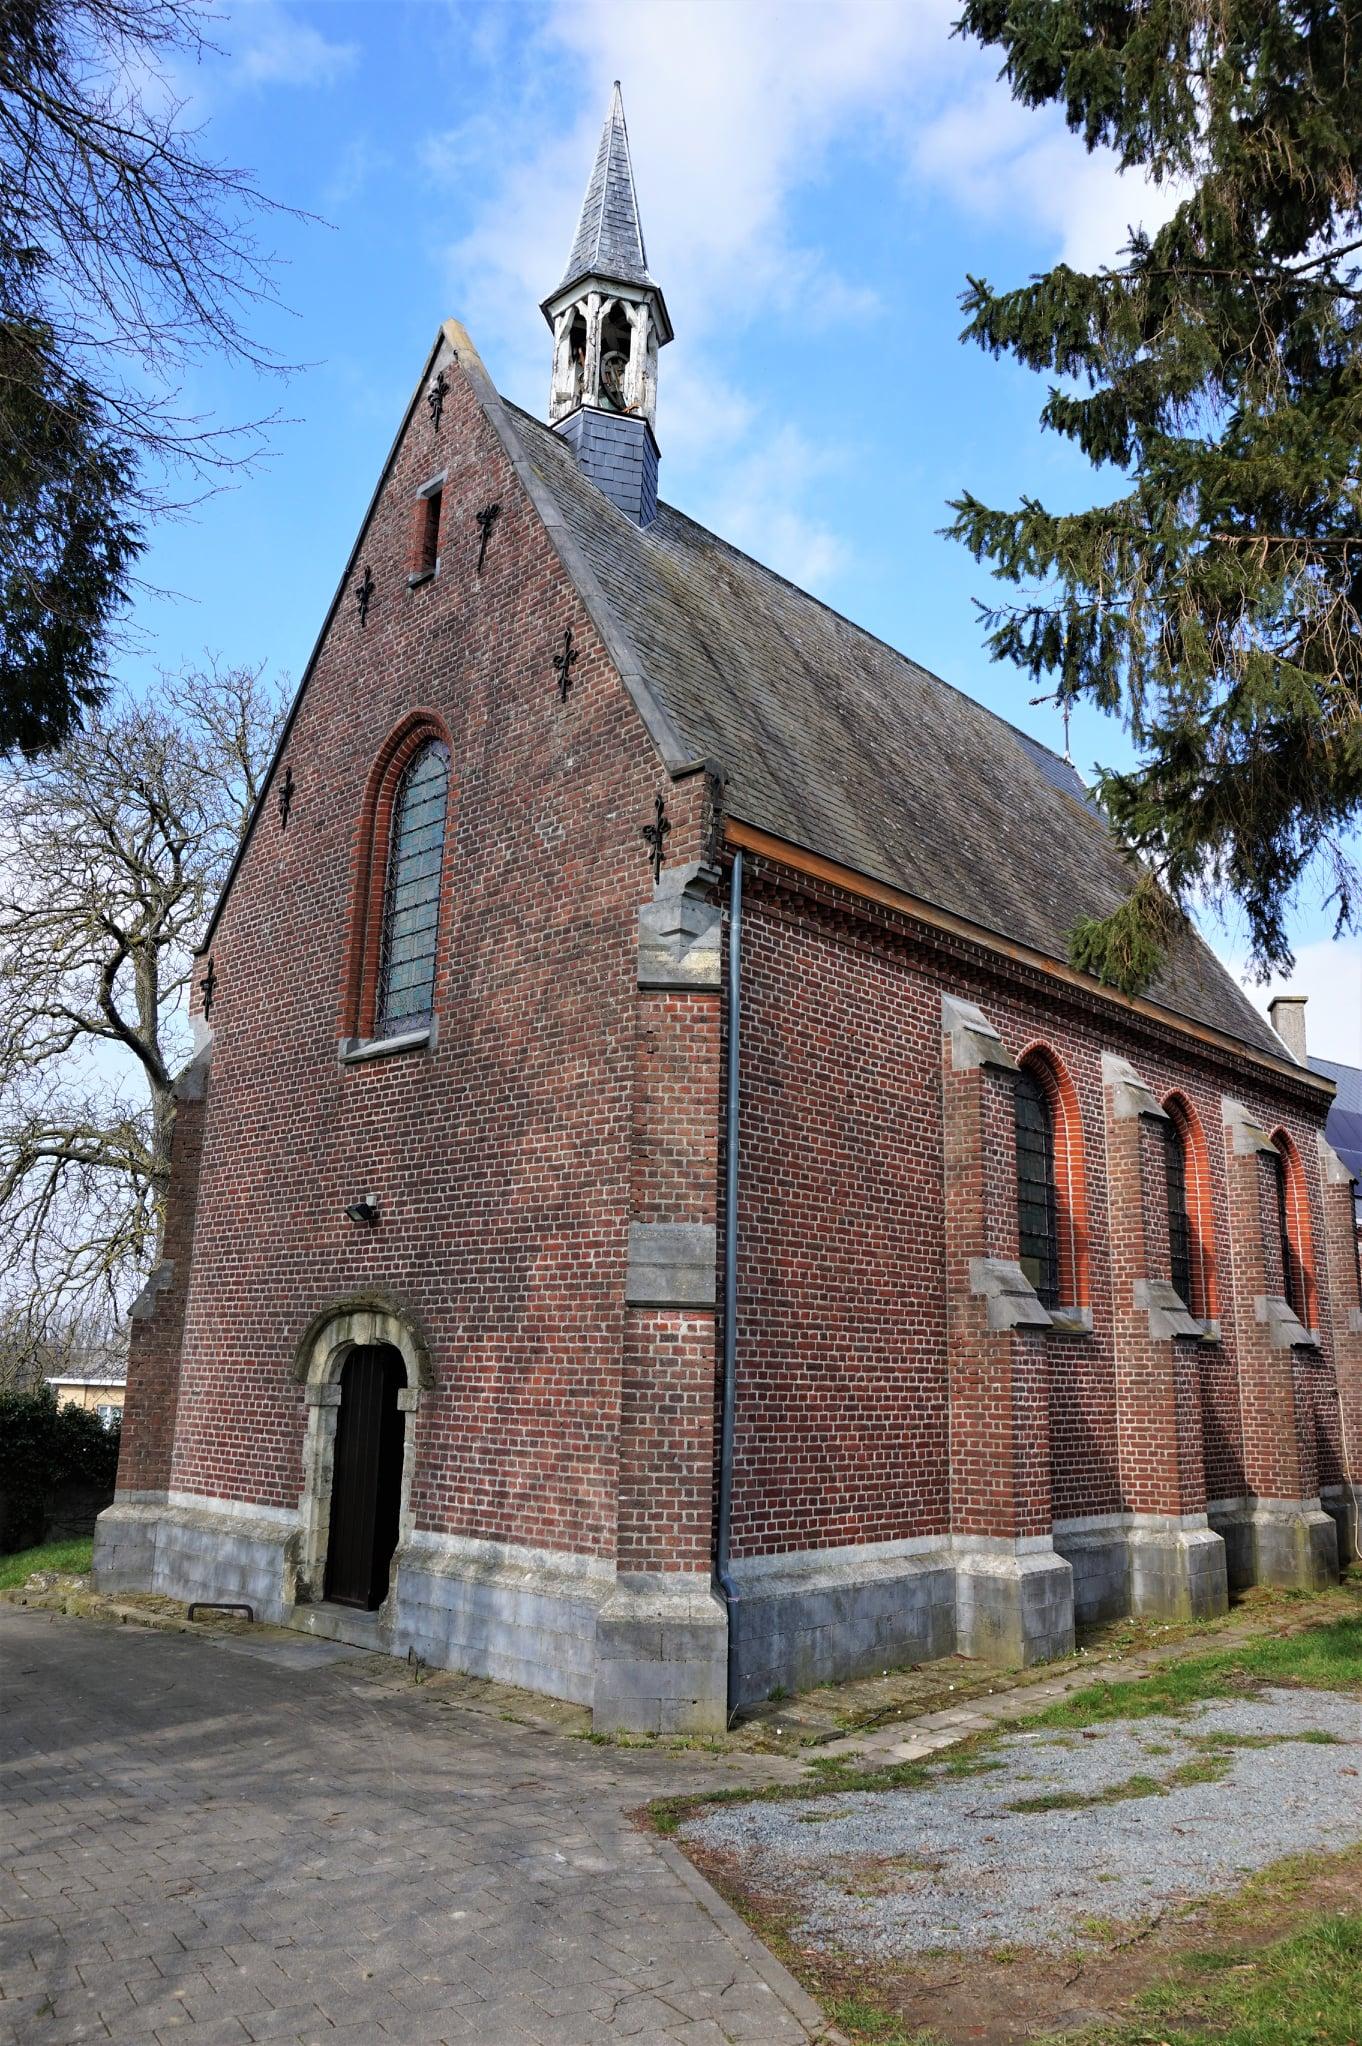 Livinuskapel in Sint-Lievens-Esse